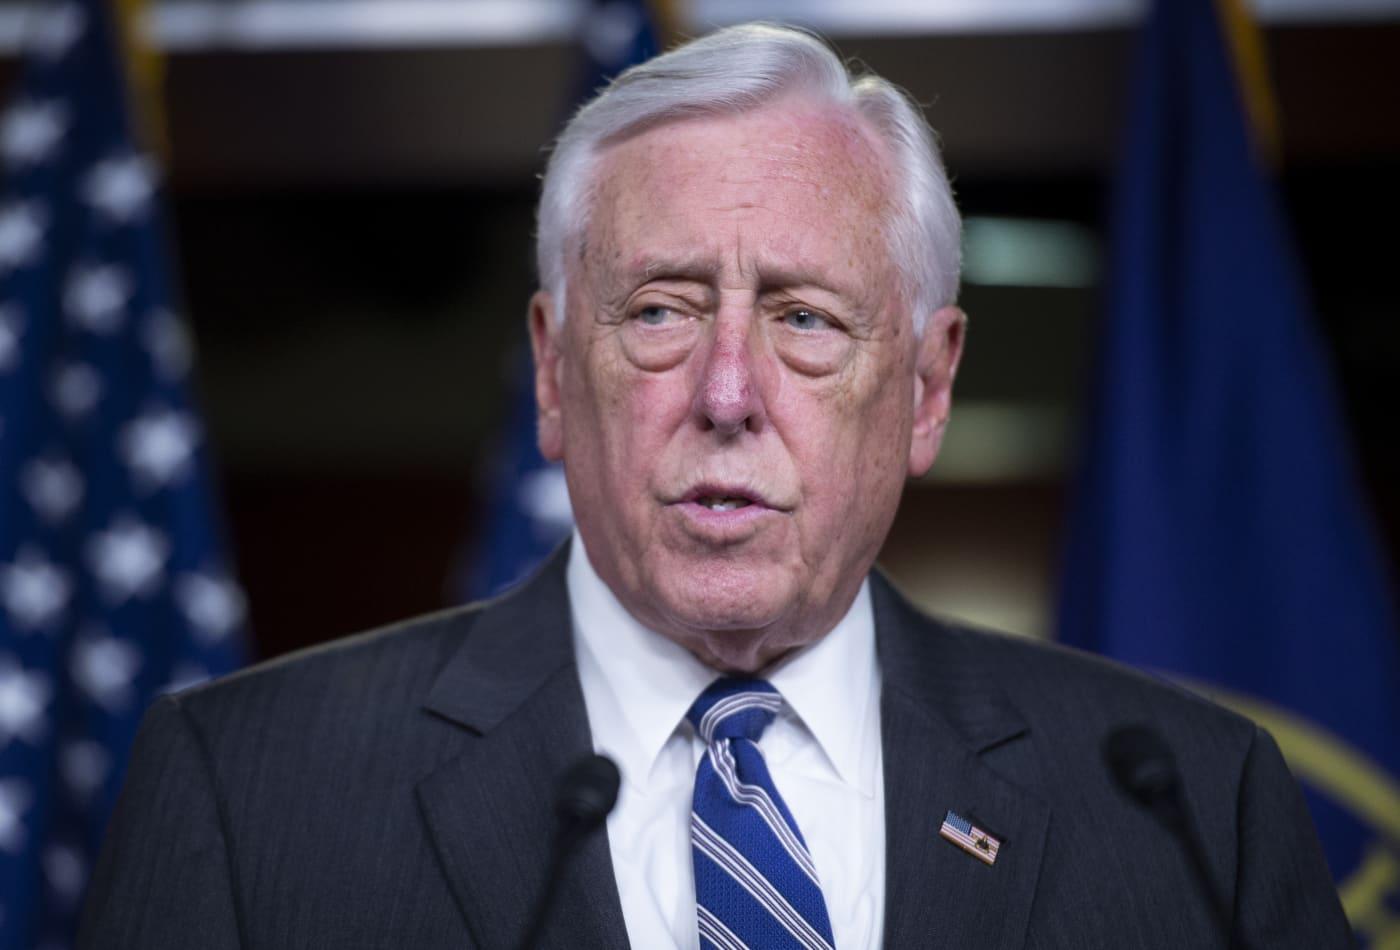 Democrats prepare to pass Covid relief bill without Republican votes